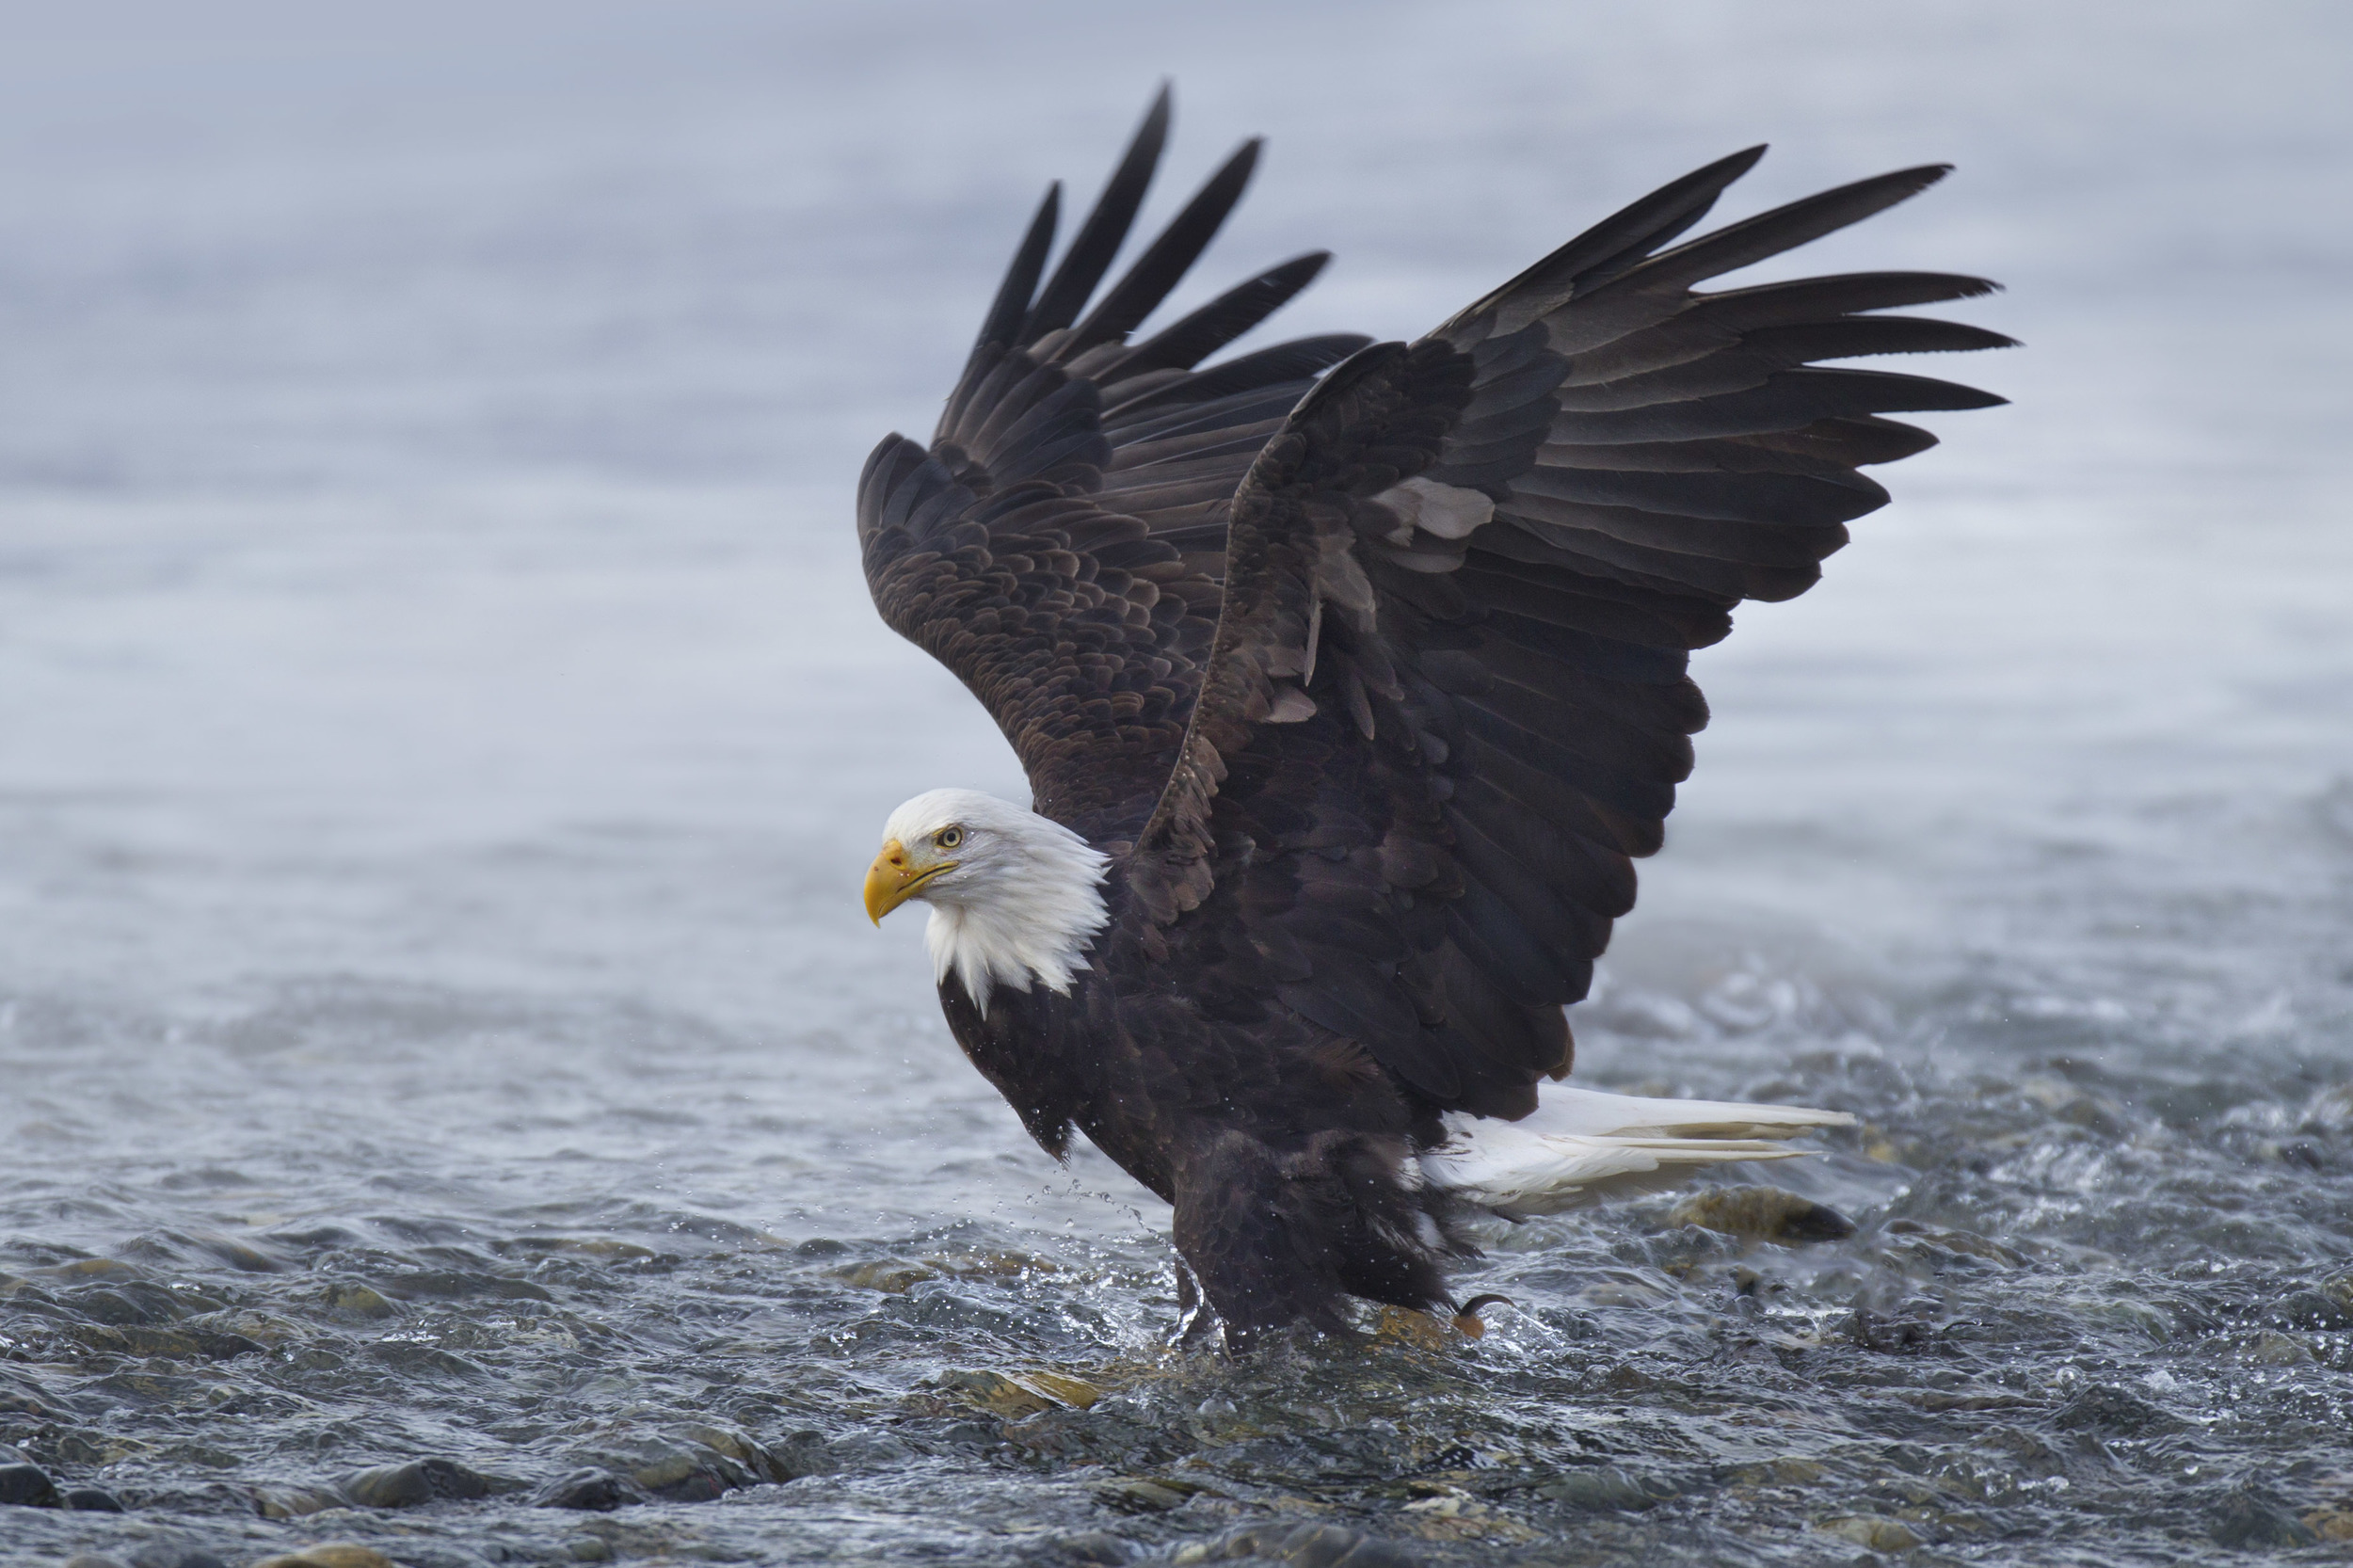 bald_eagle_00428599c.jpg